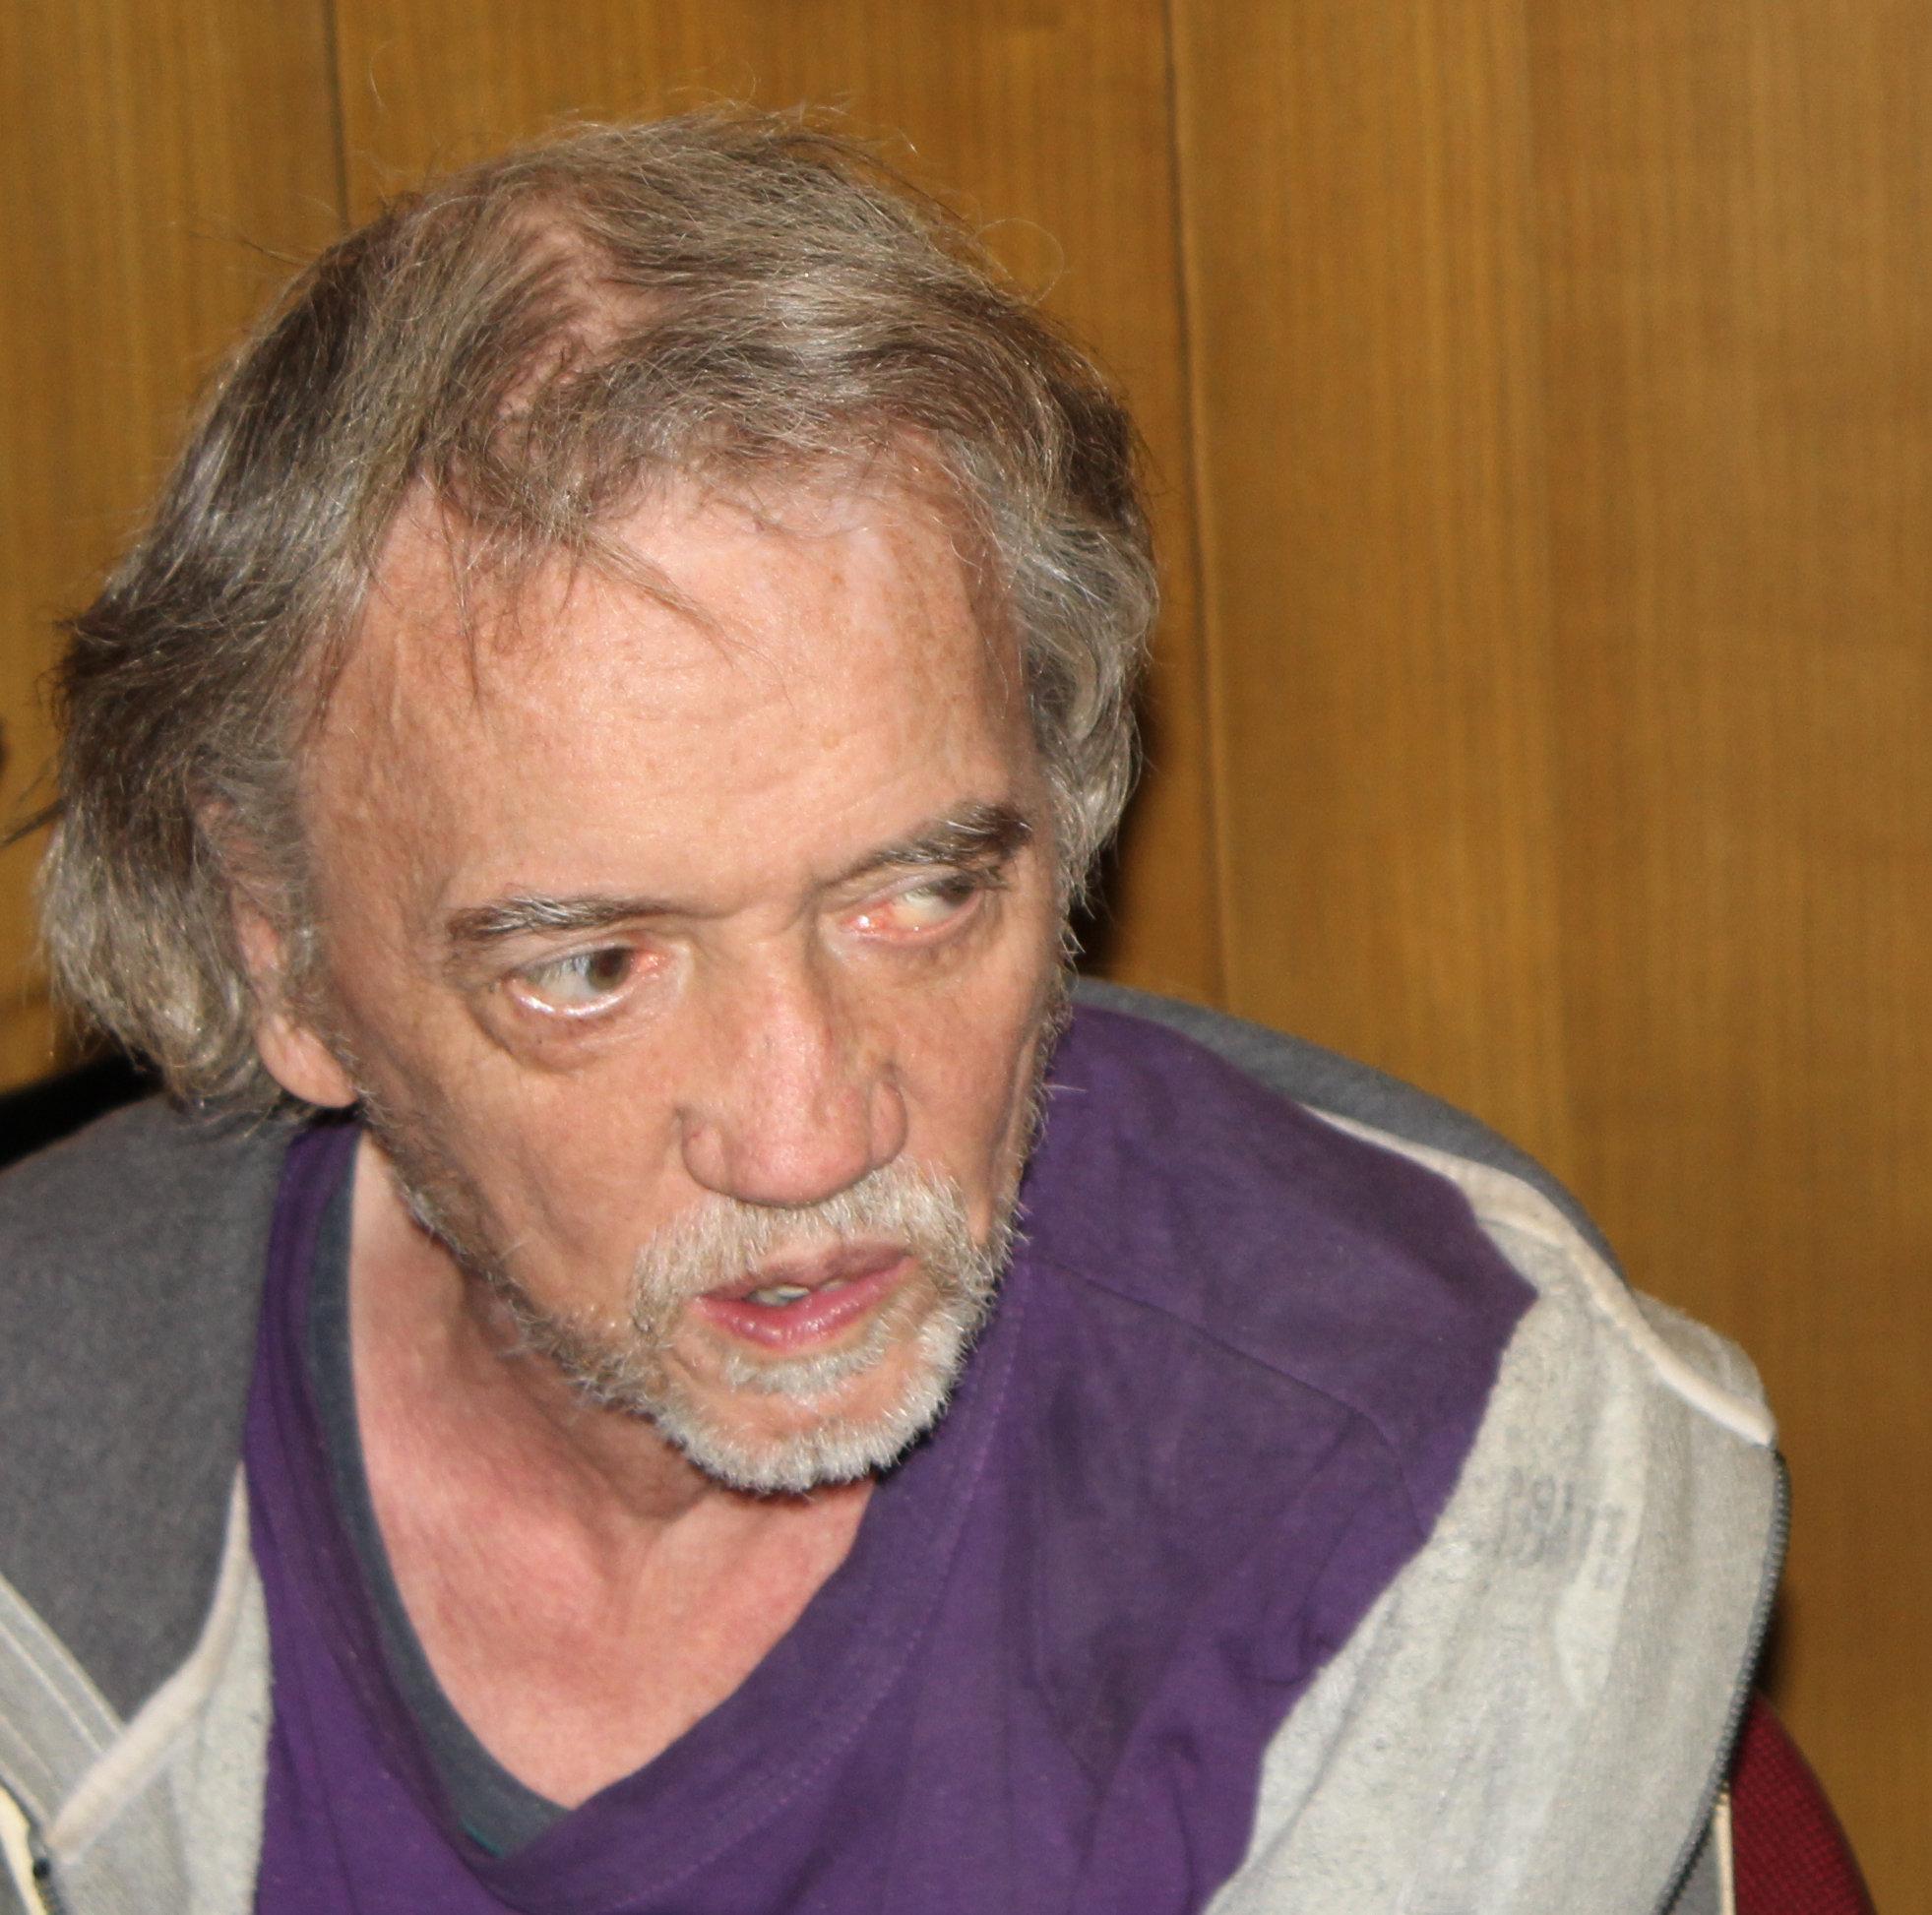 Joachim Eul am 10. September 2014 bei einer Anhörung des Bezirkes Friedrichshain-Kreuzberg in Berlin zu Coffeeshops (Foto: Maximilian Plenert)